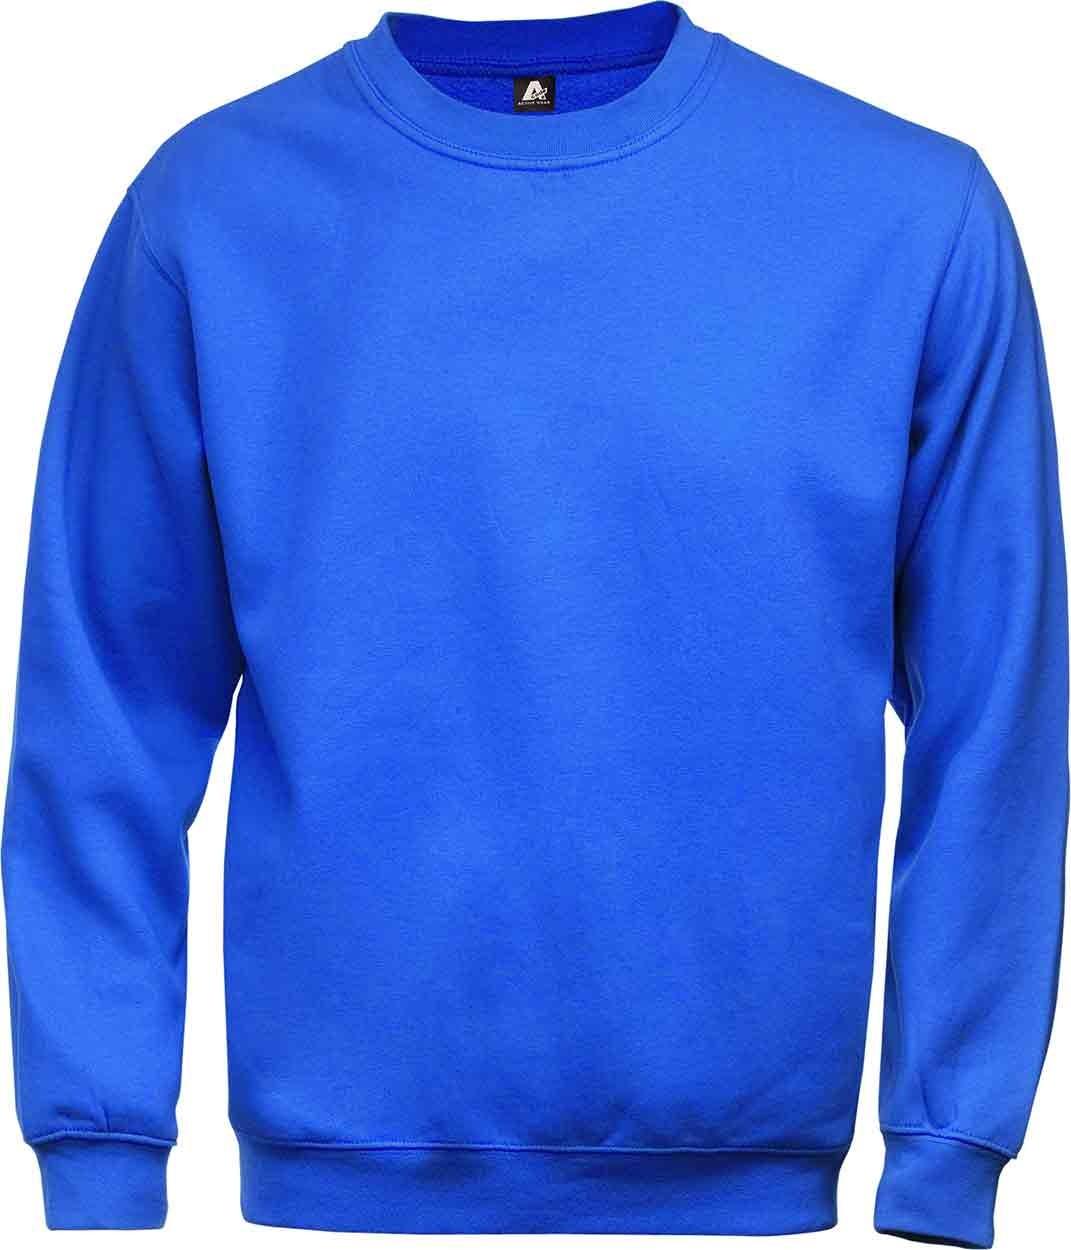 961a03527 Acode 1734 Crewneck Sweatshirt - Workwear Sweatshirts - Workwear ...